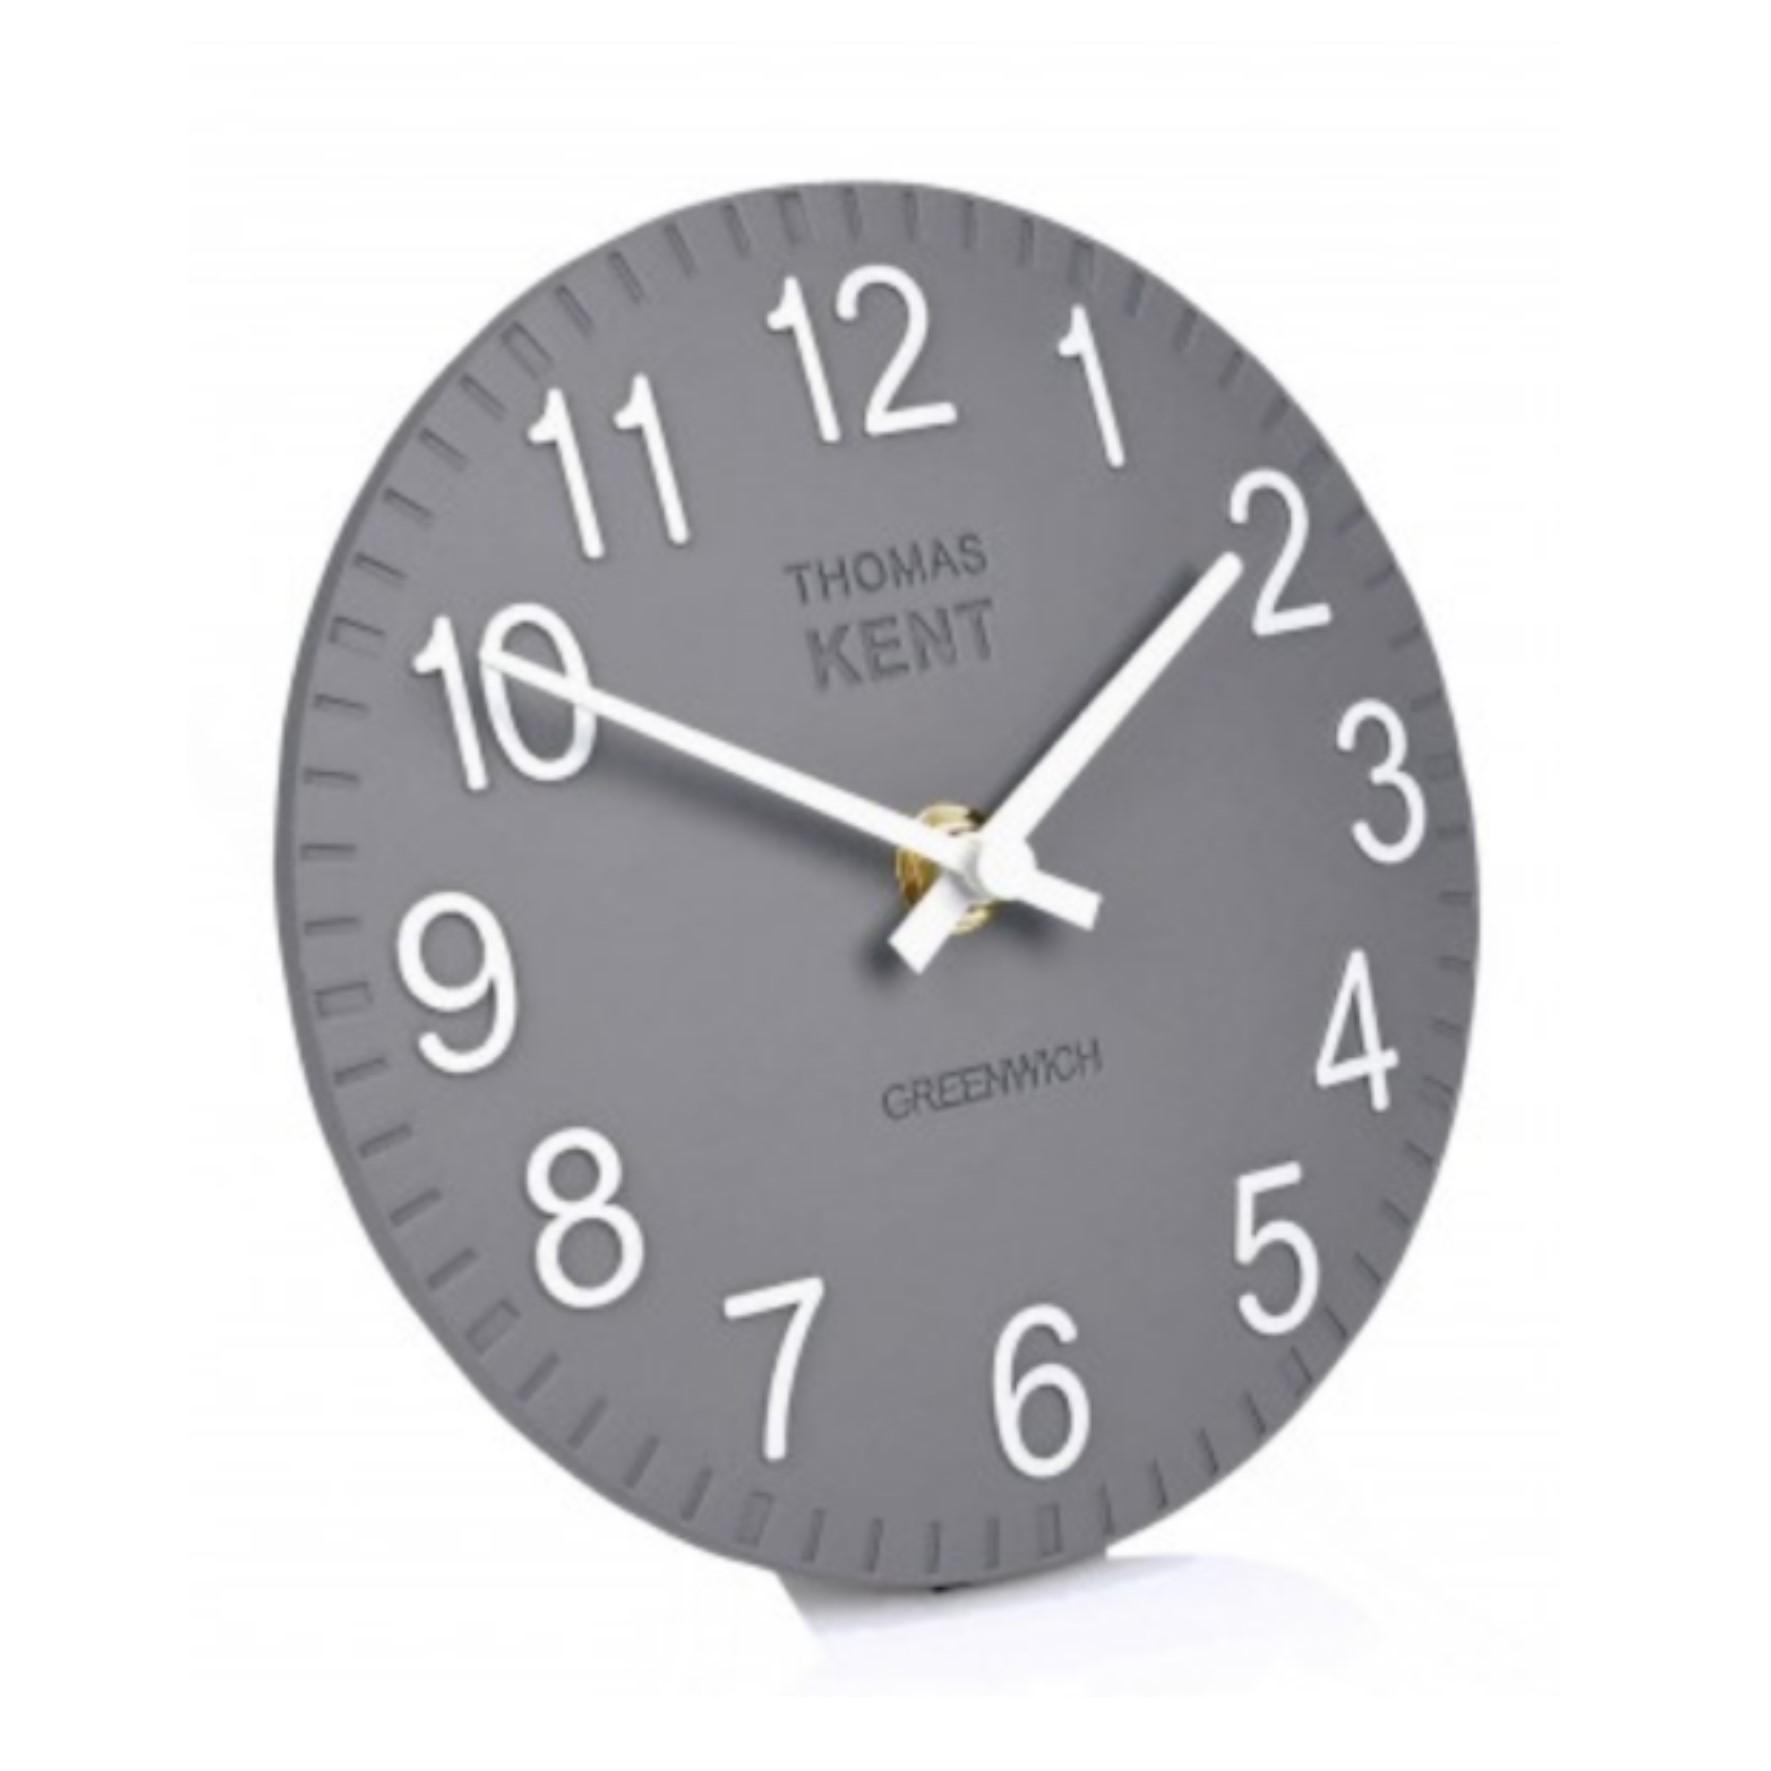 6inch Cotswold Mantel Clock